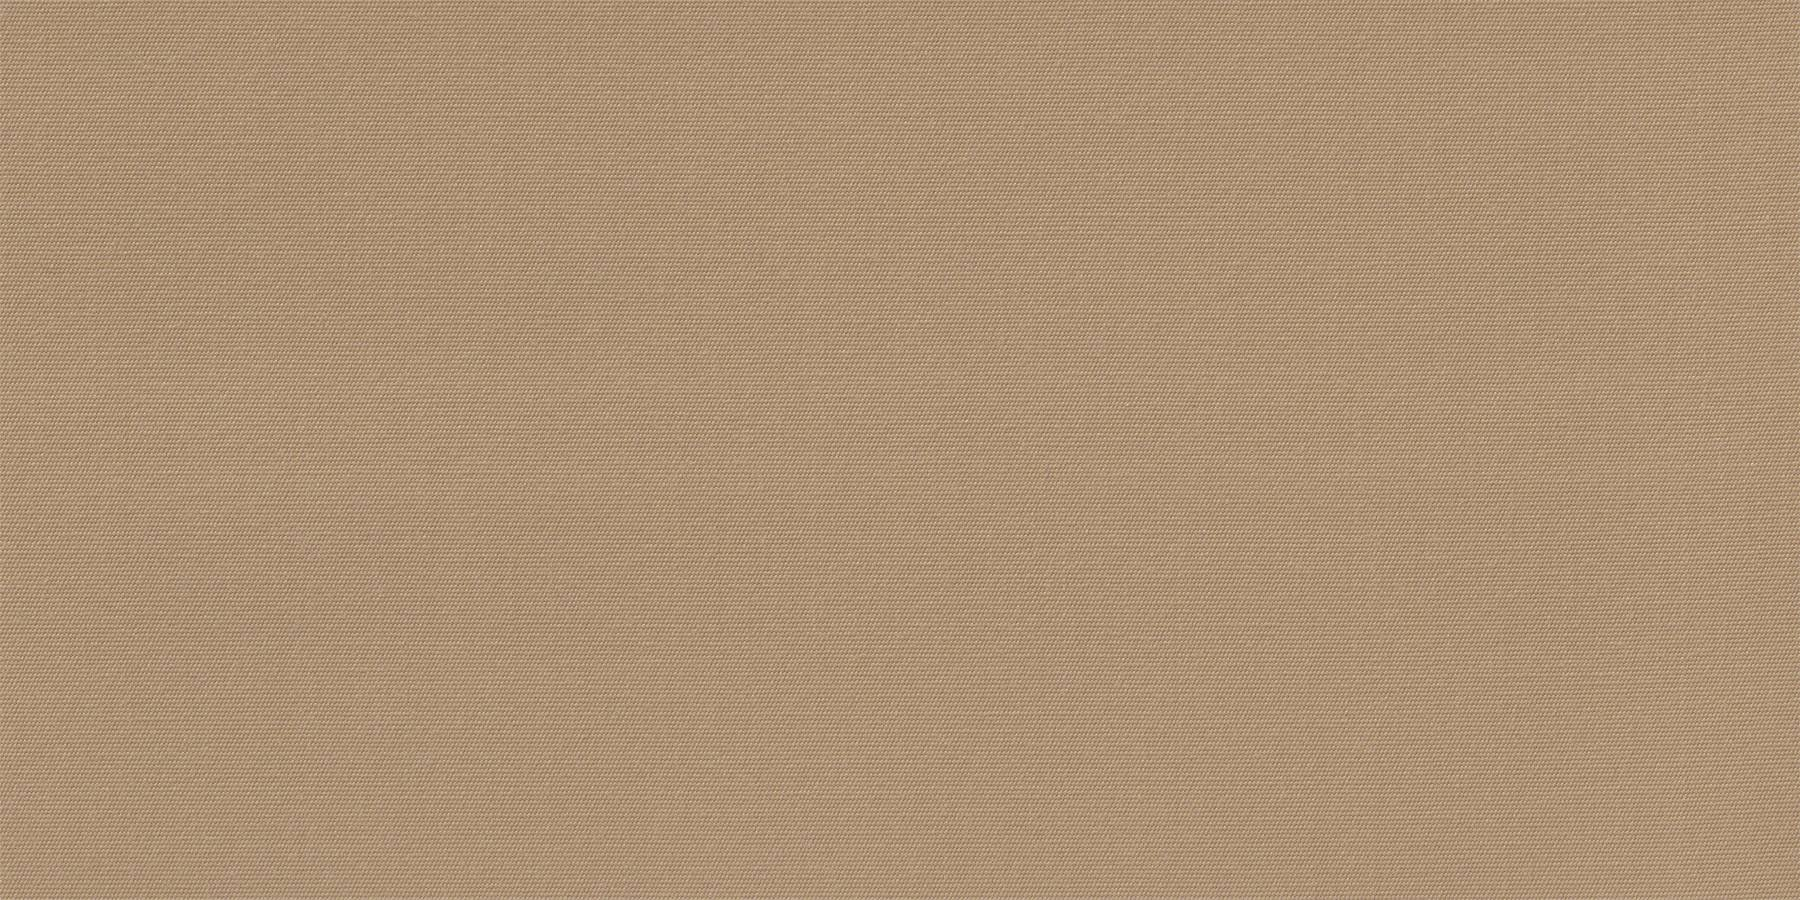 Acryl solid - Beige